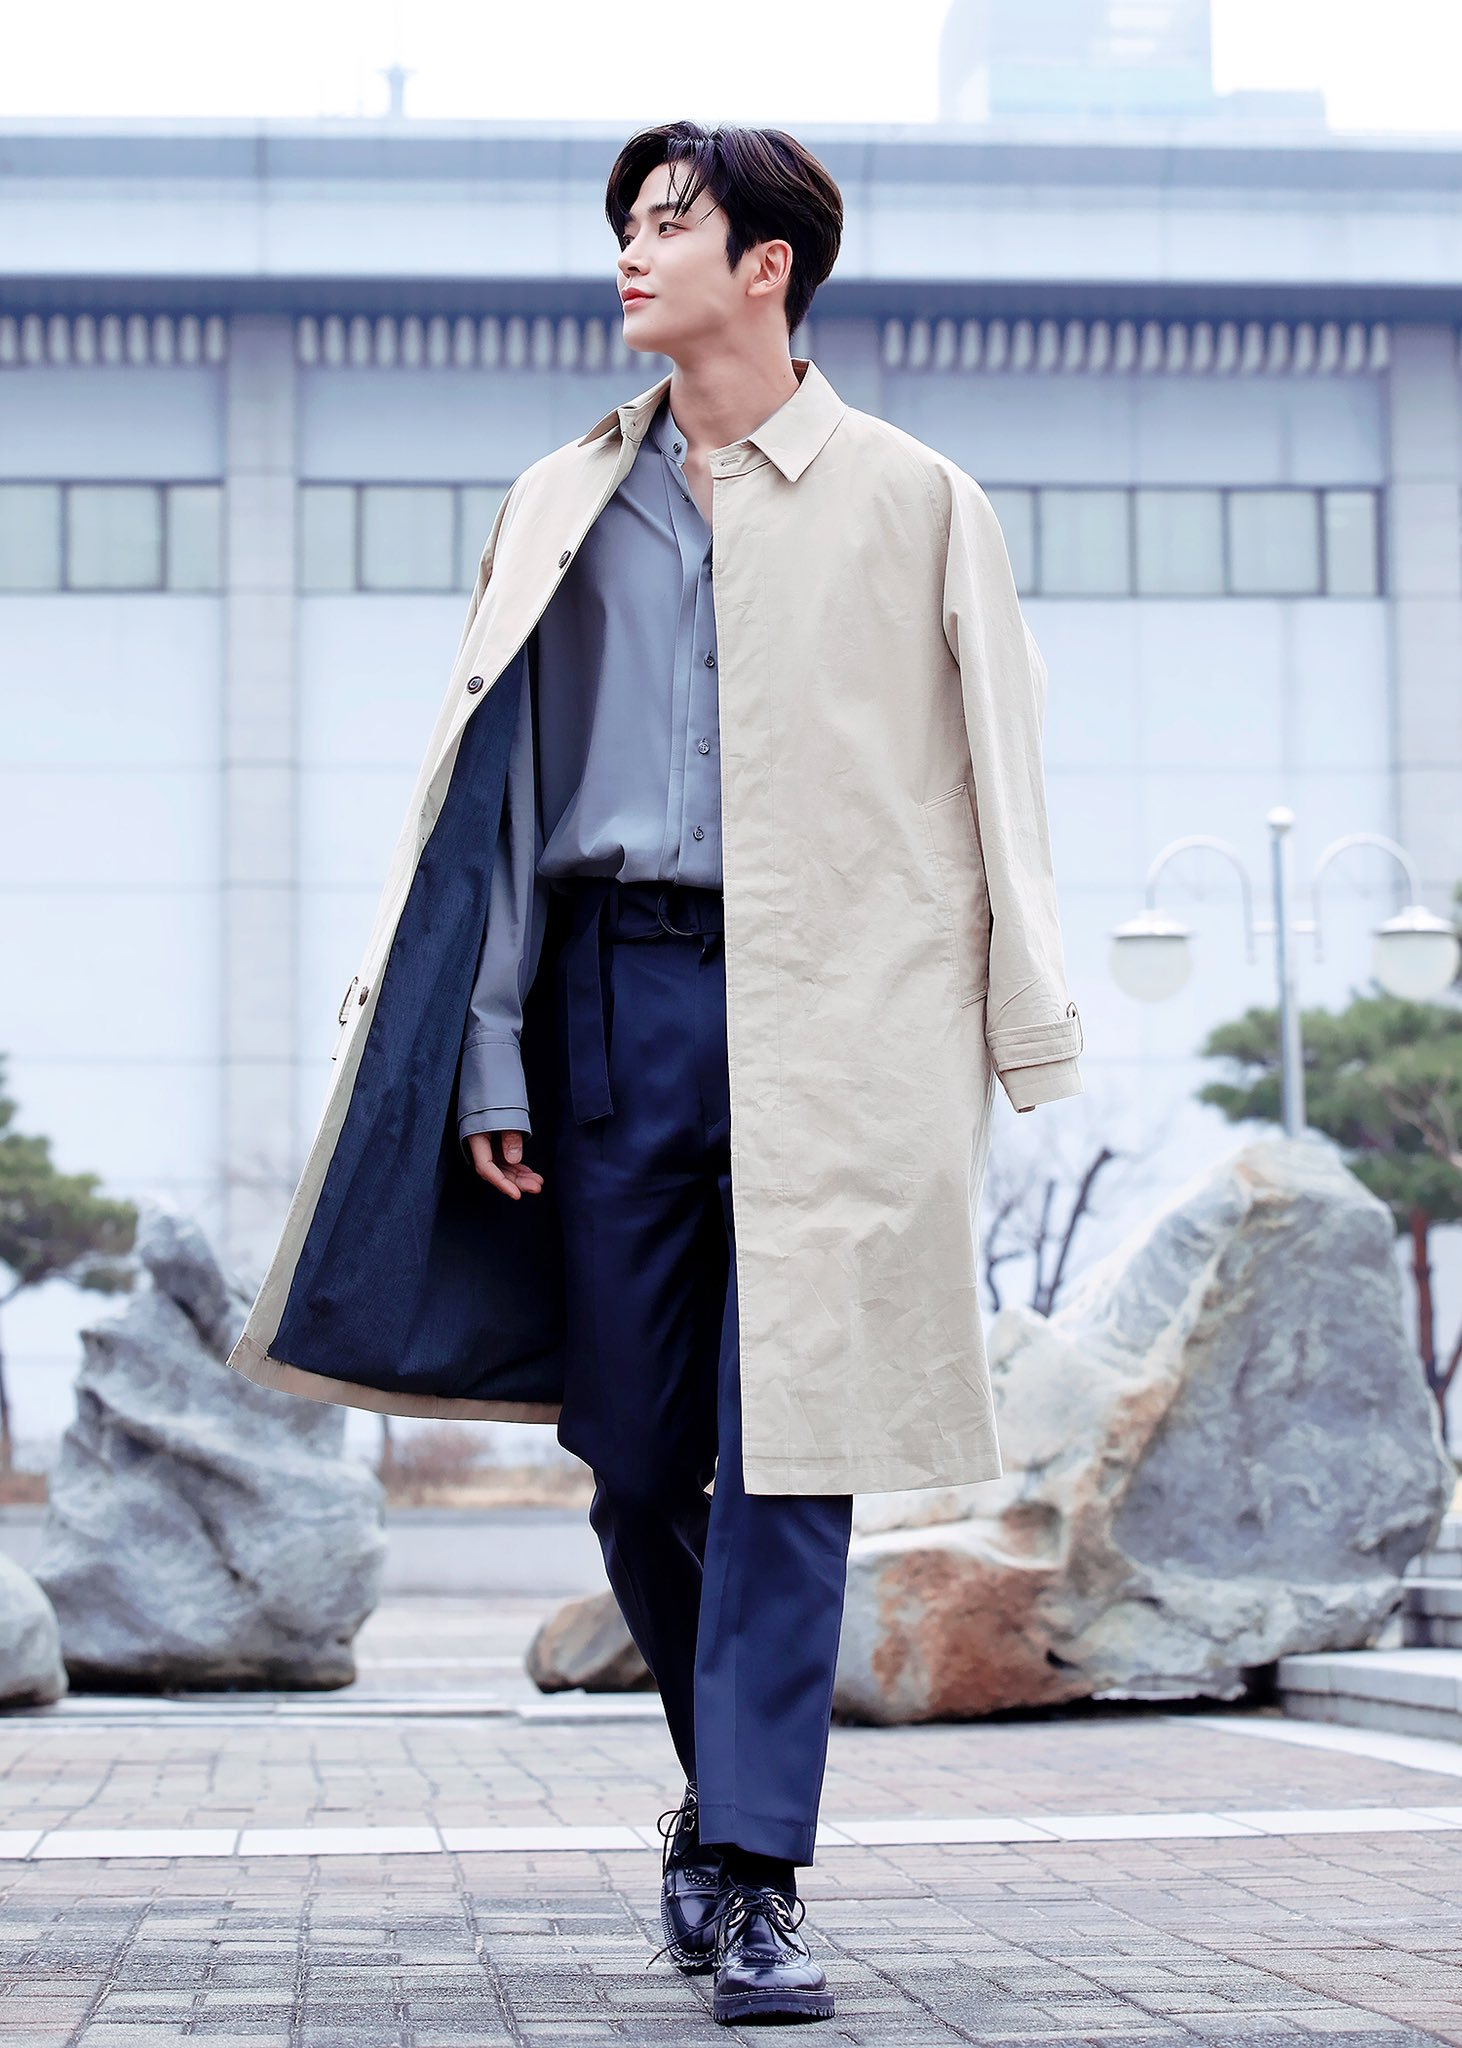 tall korean celebrities, idols 187 cm, actors 187 cm, rowoon